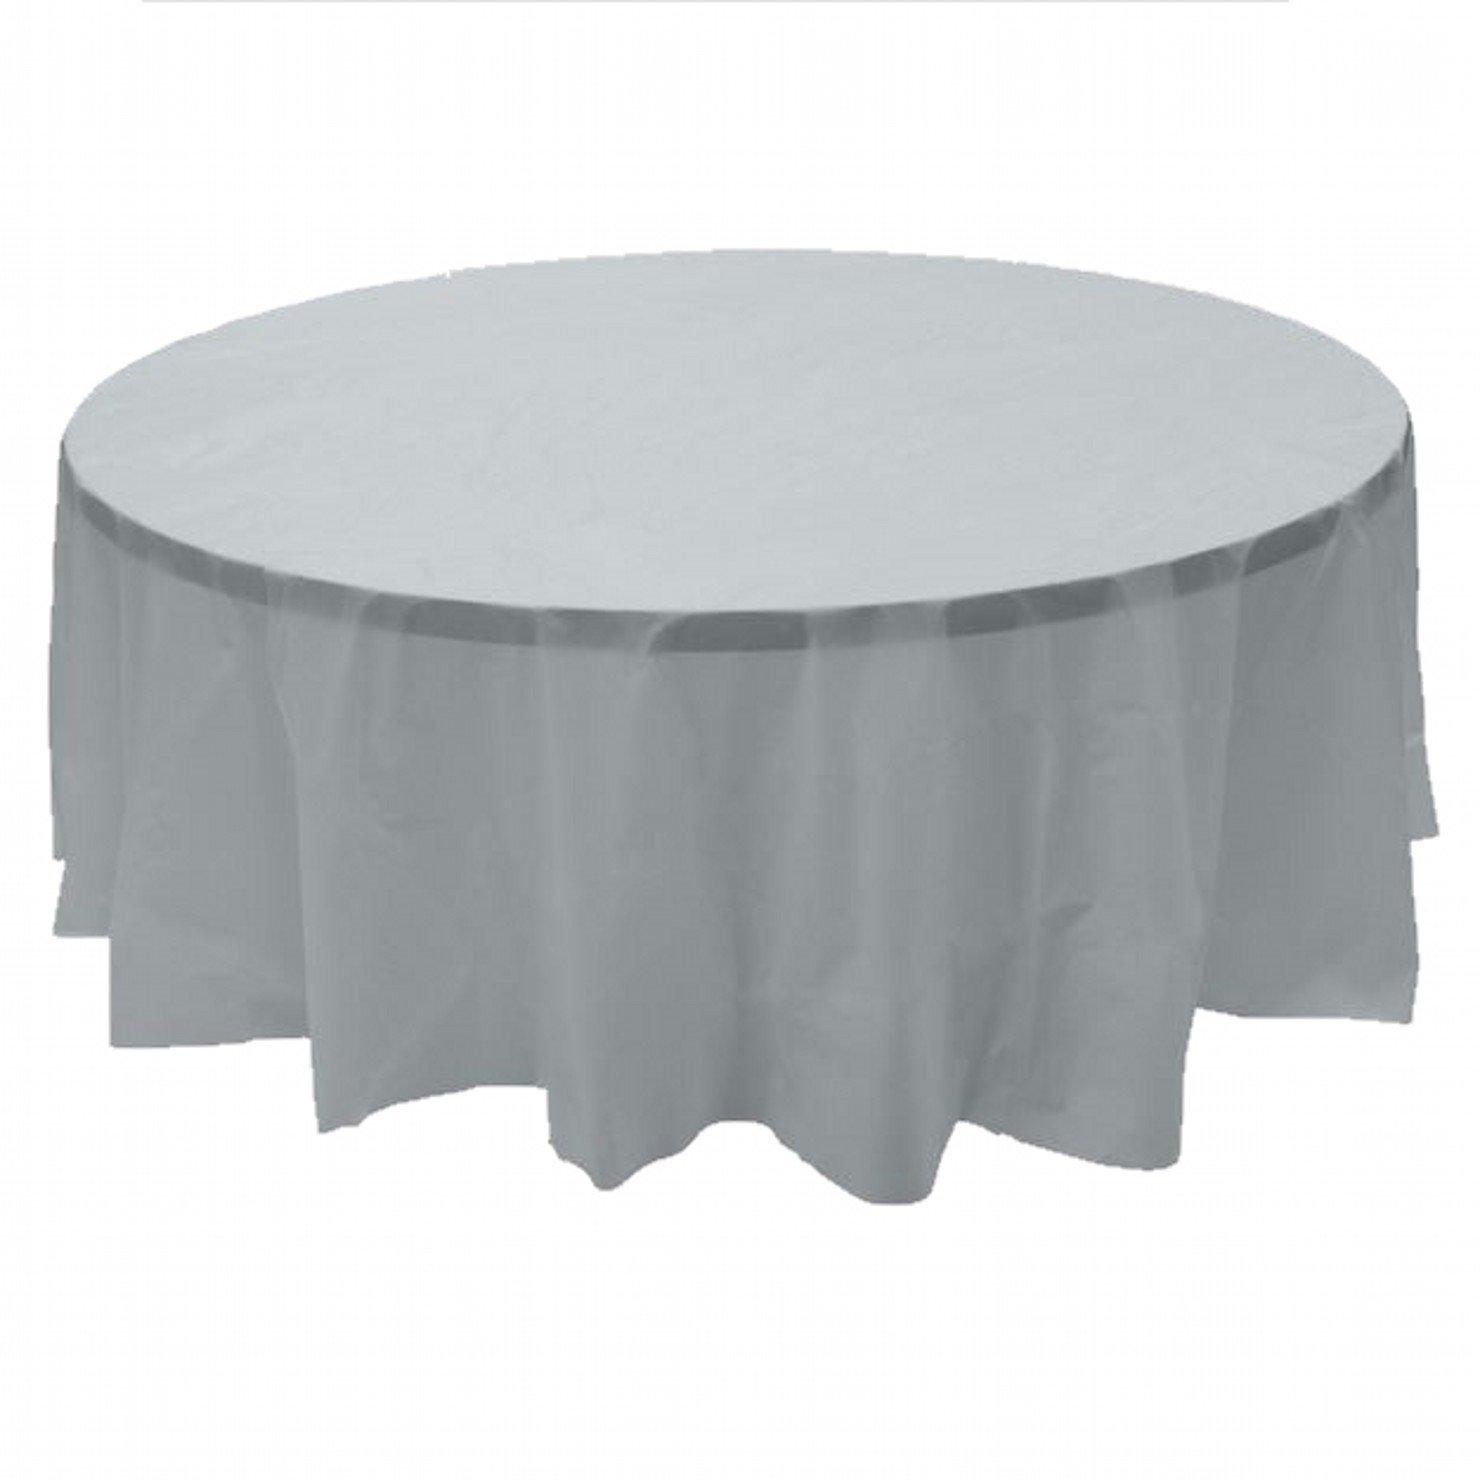 24 pcs (1 case) of Plastic Heavy Duty Premium Round tablecloths 84'' Diameter Table Cover - Silver